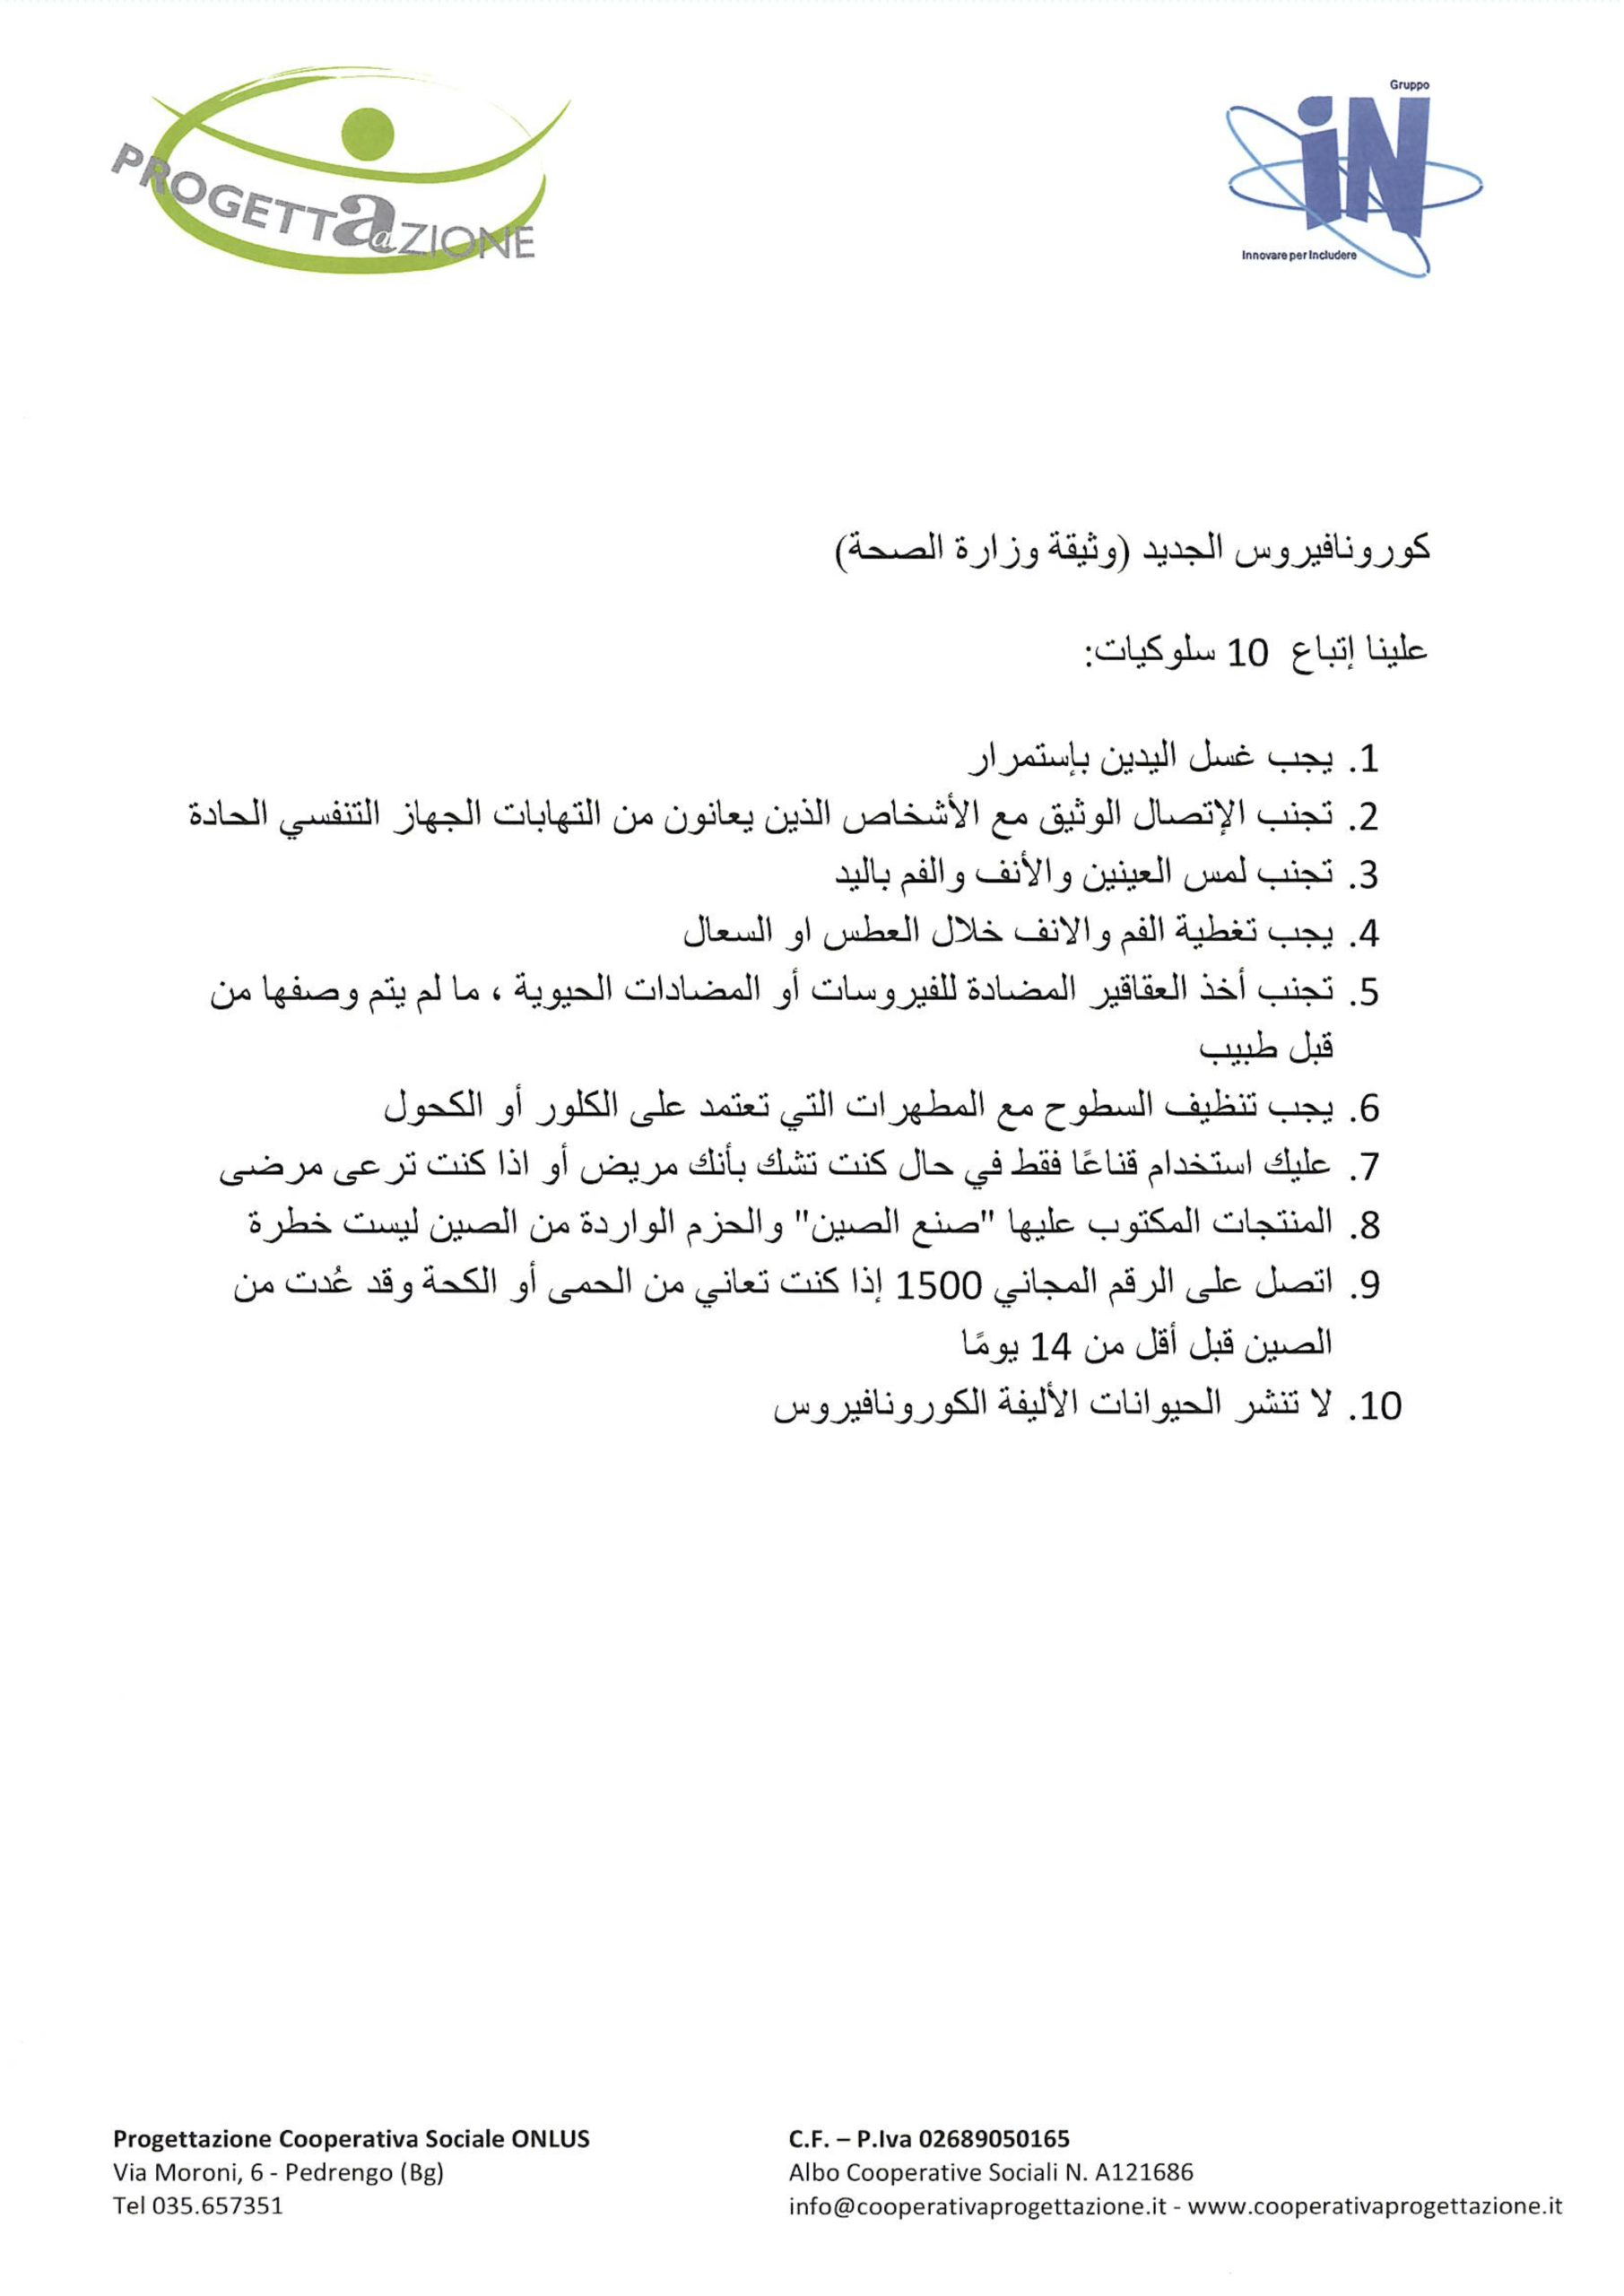 Decalogo in Arabo